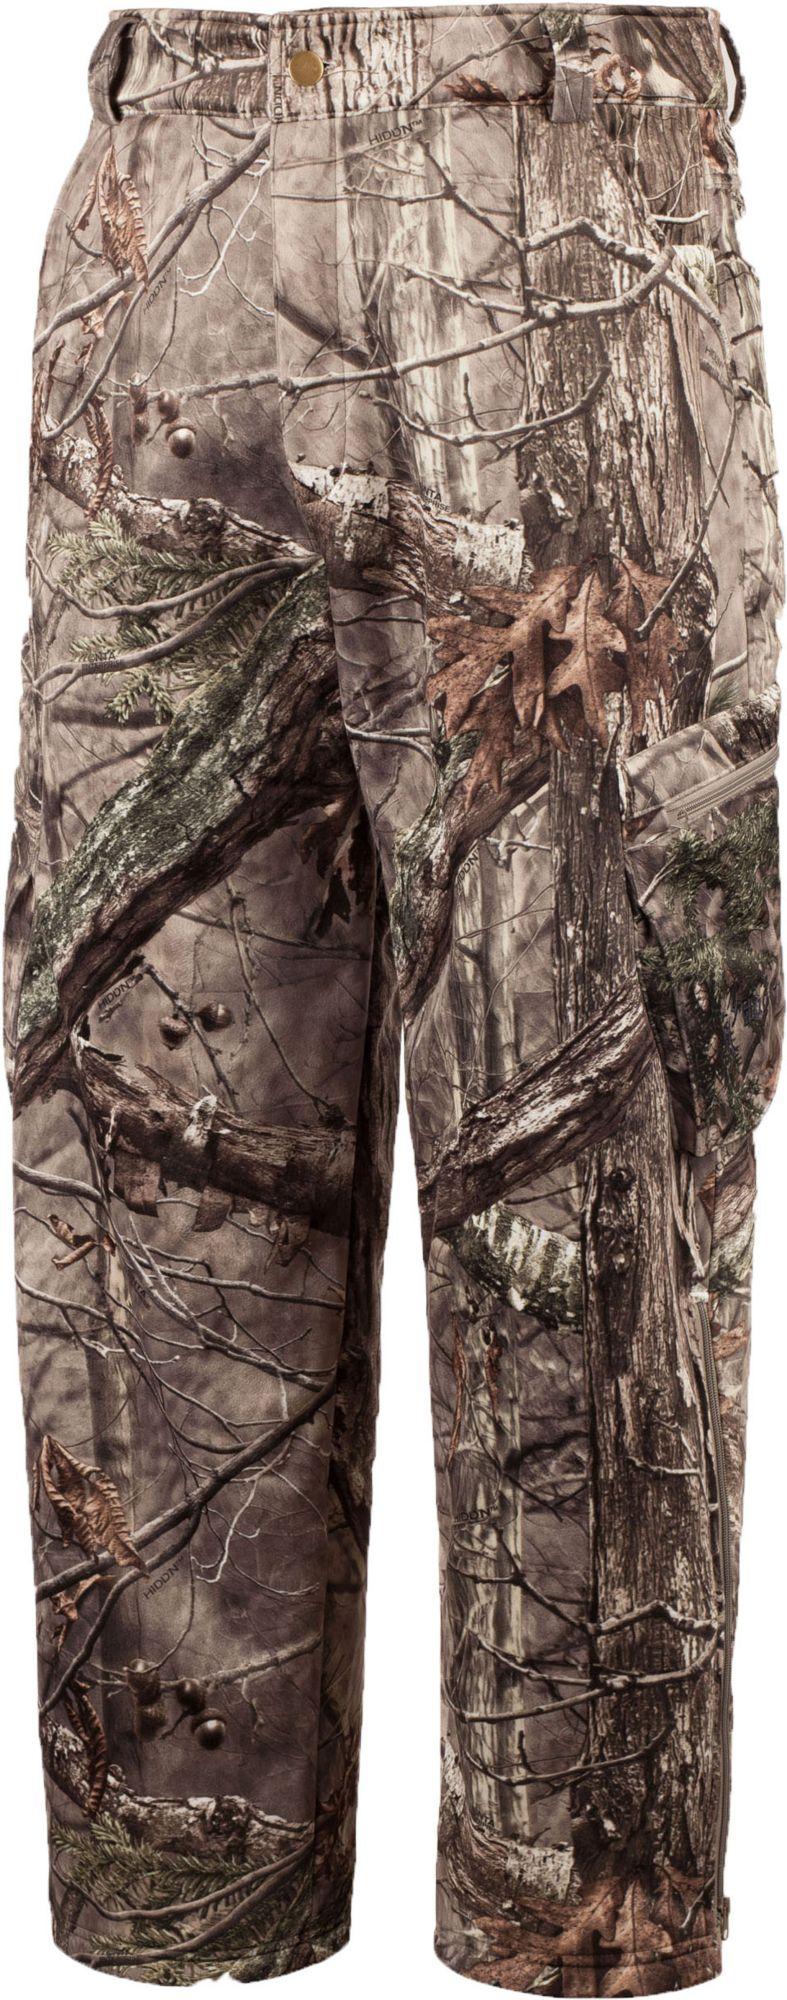 Huntworth Men's Soft Shell Hunting Pants, Size: Large, Hidd N Camo thumbnail